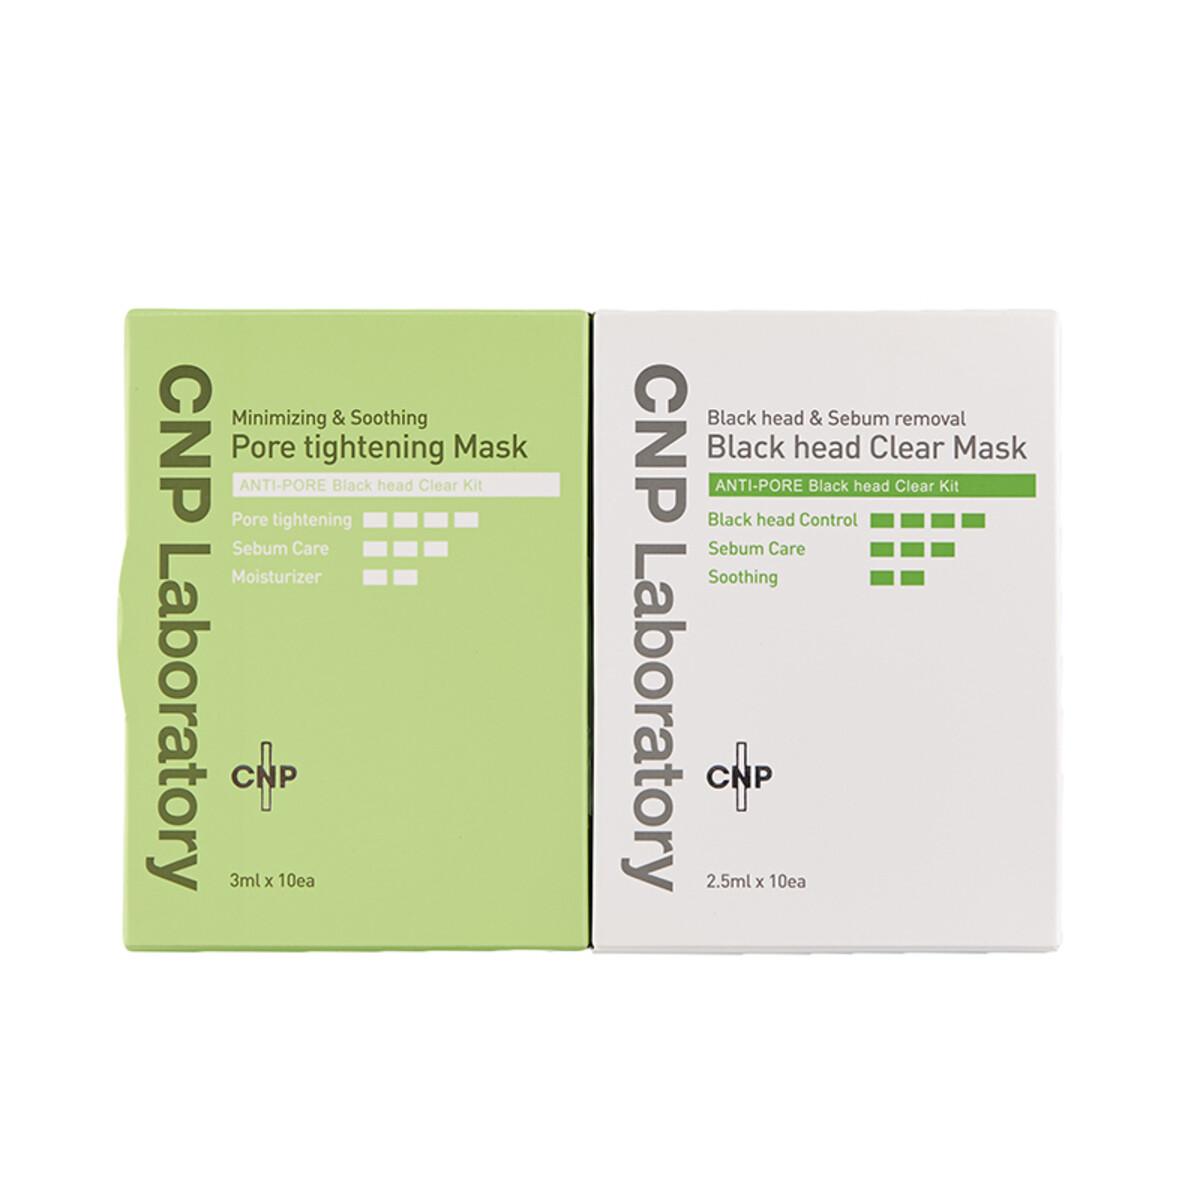 CNP Blackhead Nose Patch Nasal Mask/Constrictive Pore Nose Patch 韩国CNP Laboratory 毛孔緊緻去黑头鼻贴套裝